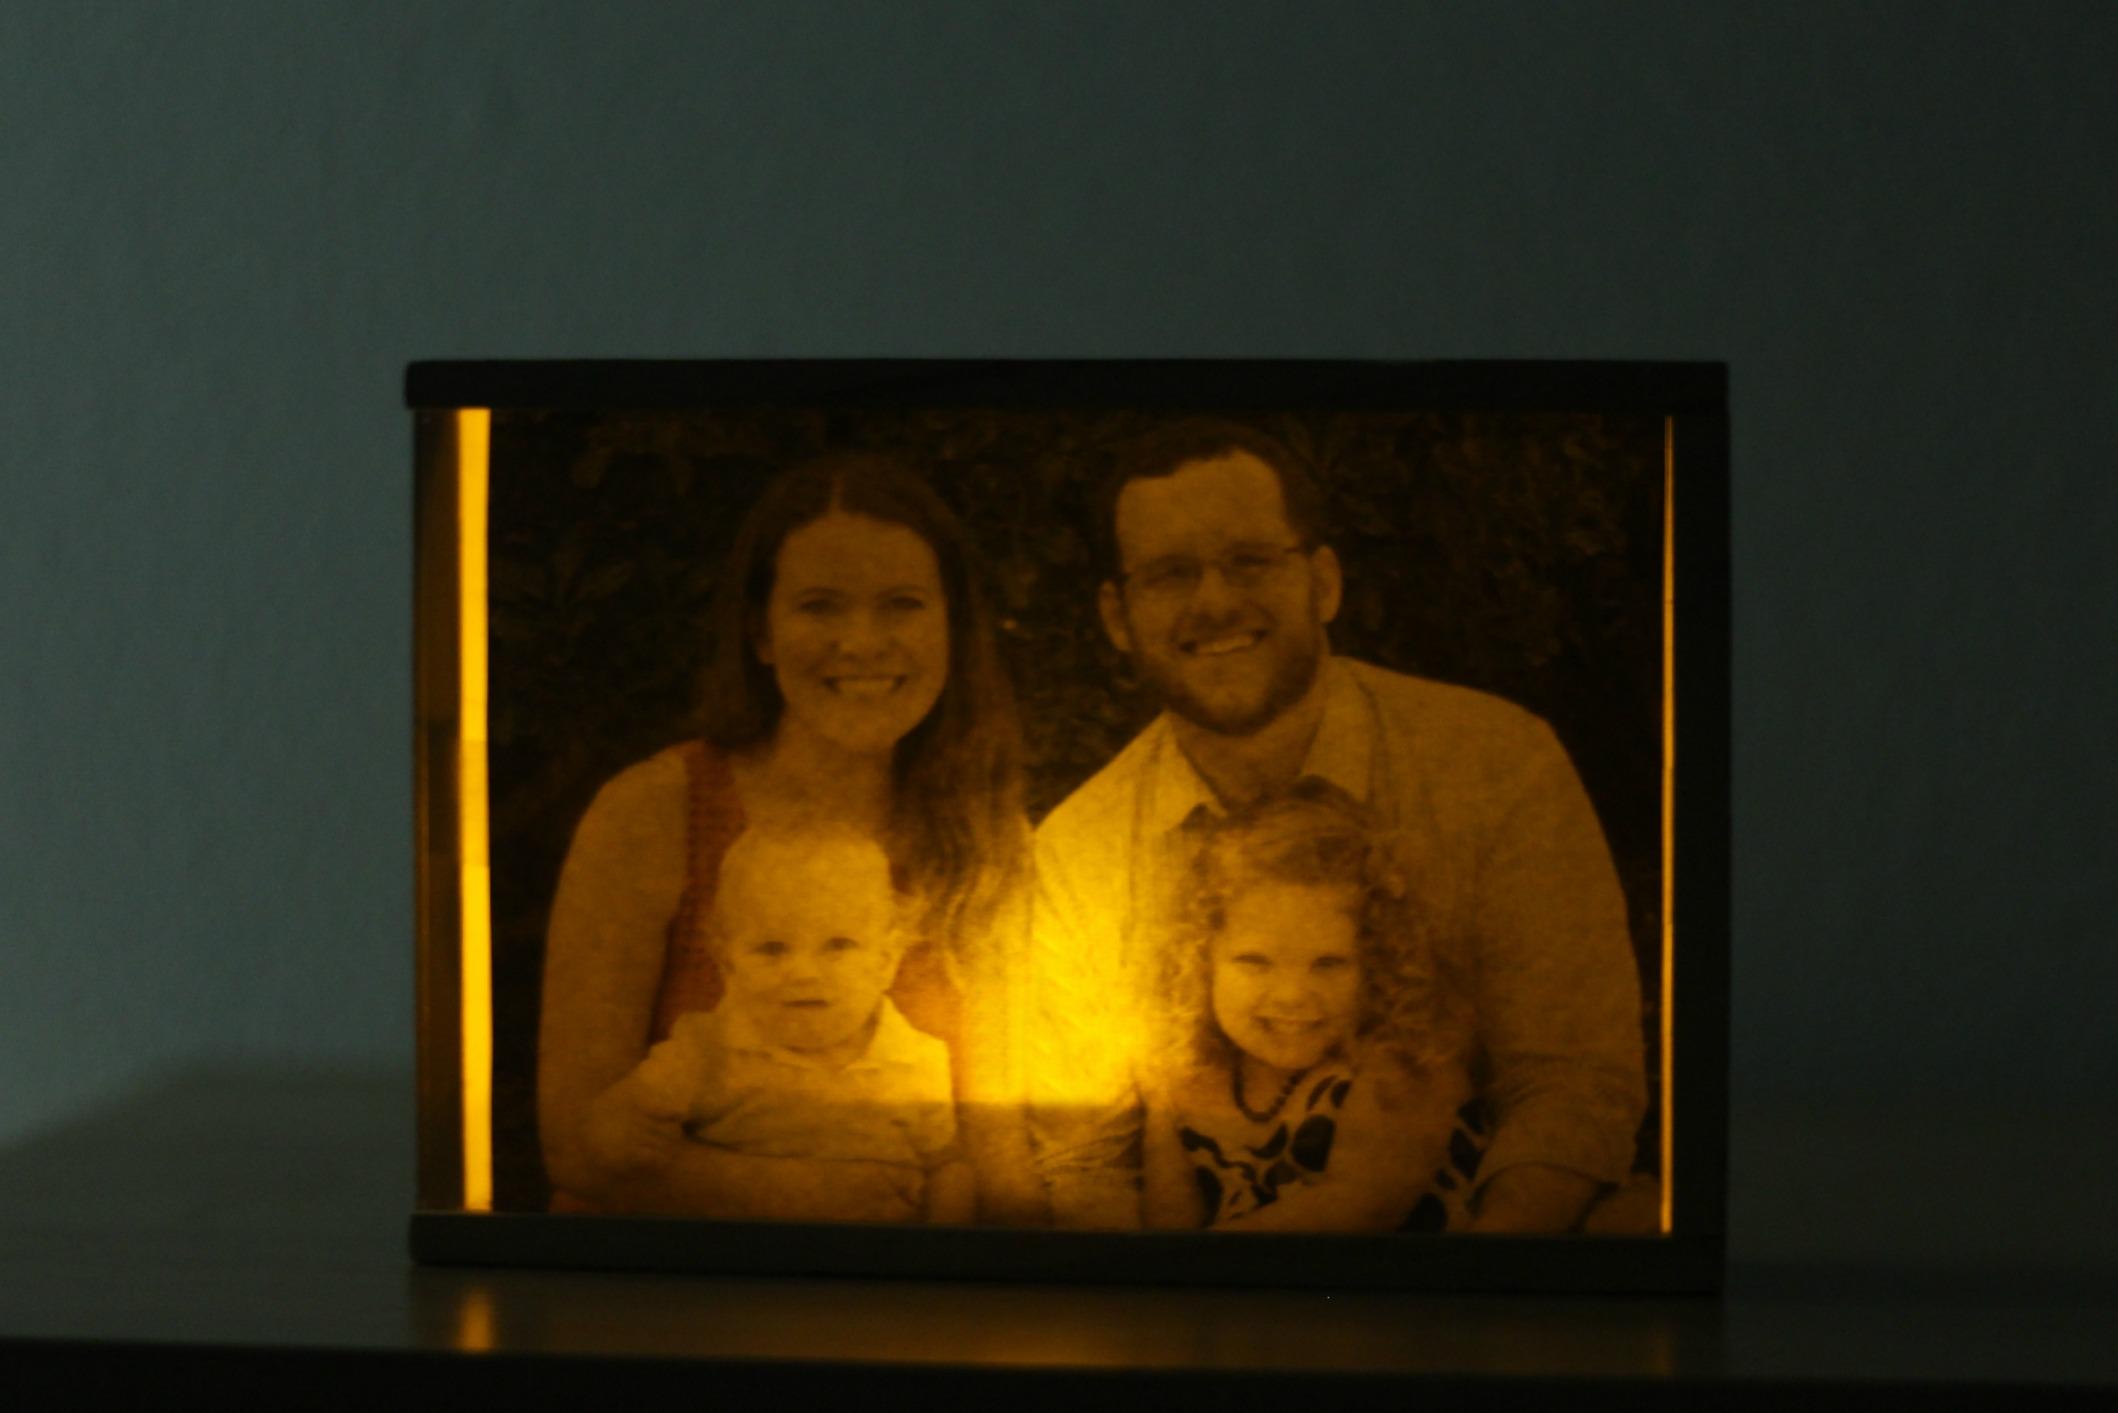 How to make a diy night light for kids happily ever mom family photo night light jeuxipadfo Choice Image